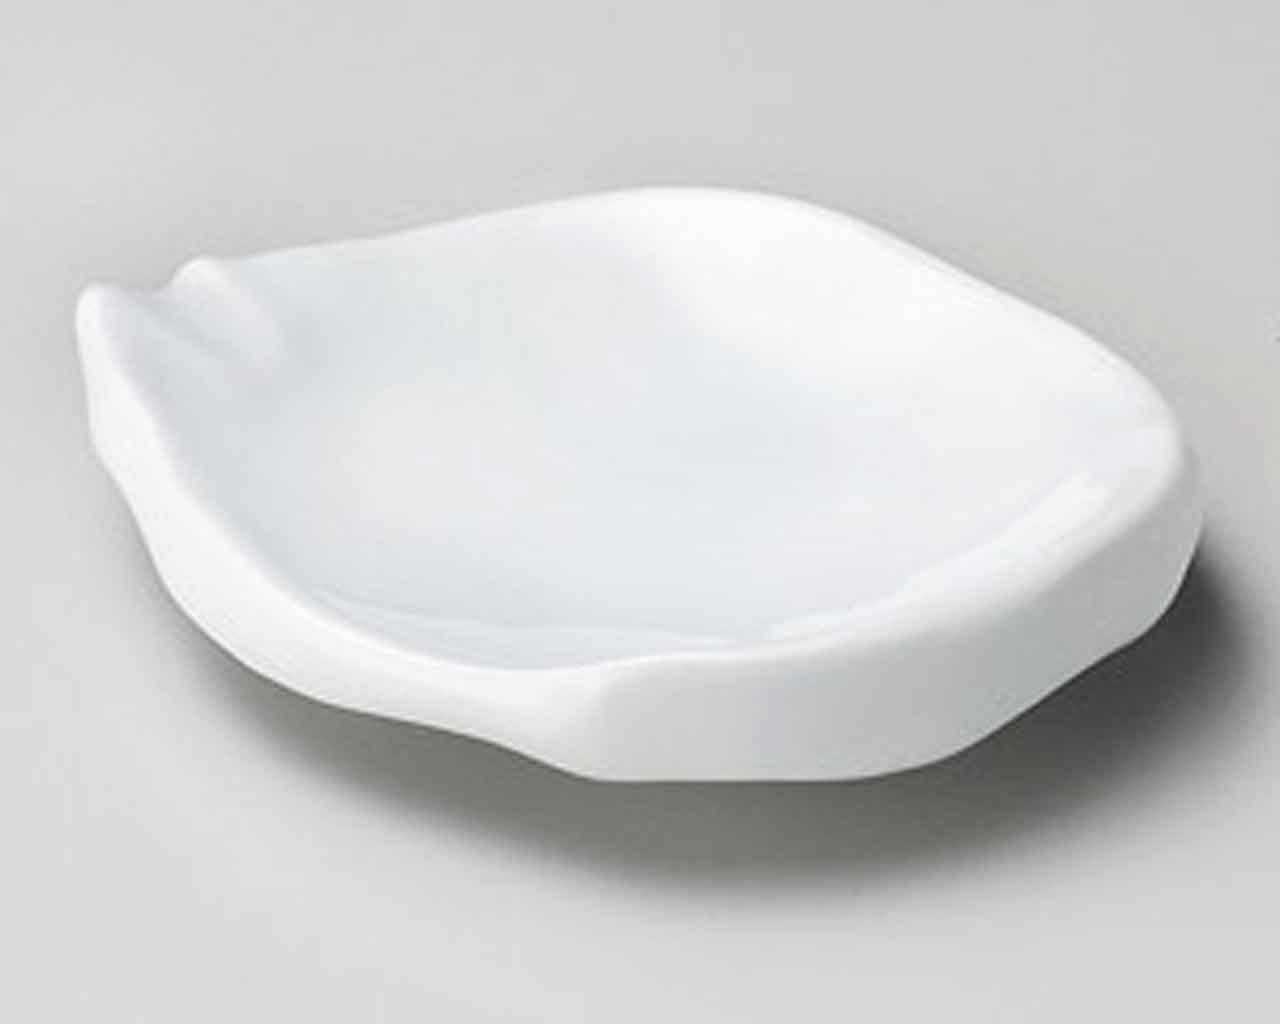 Seiji Chigiri 5.5inch Small Plate White porcelain Made in Japan